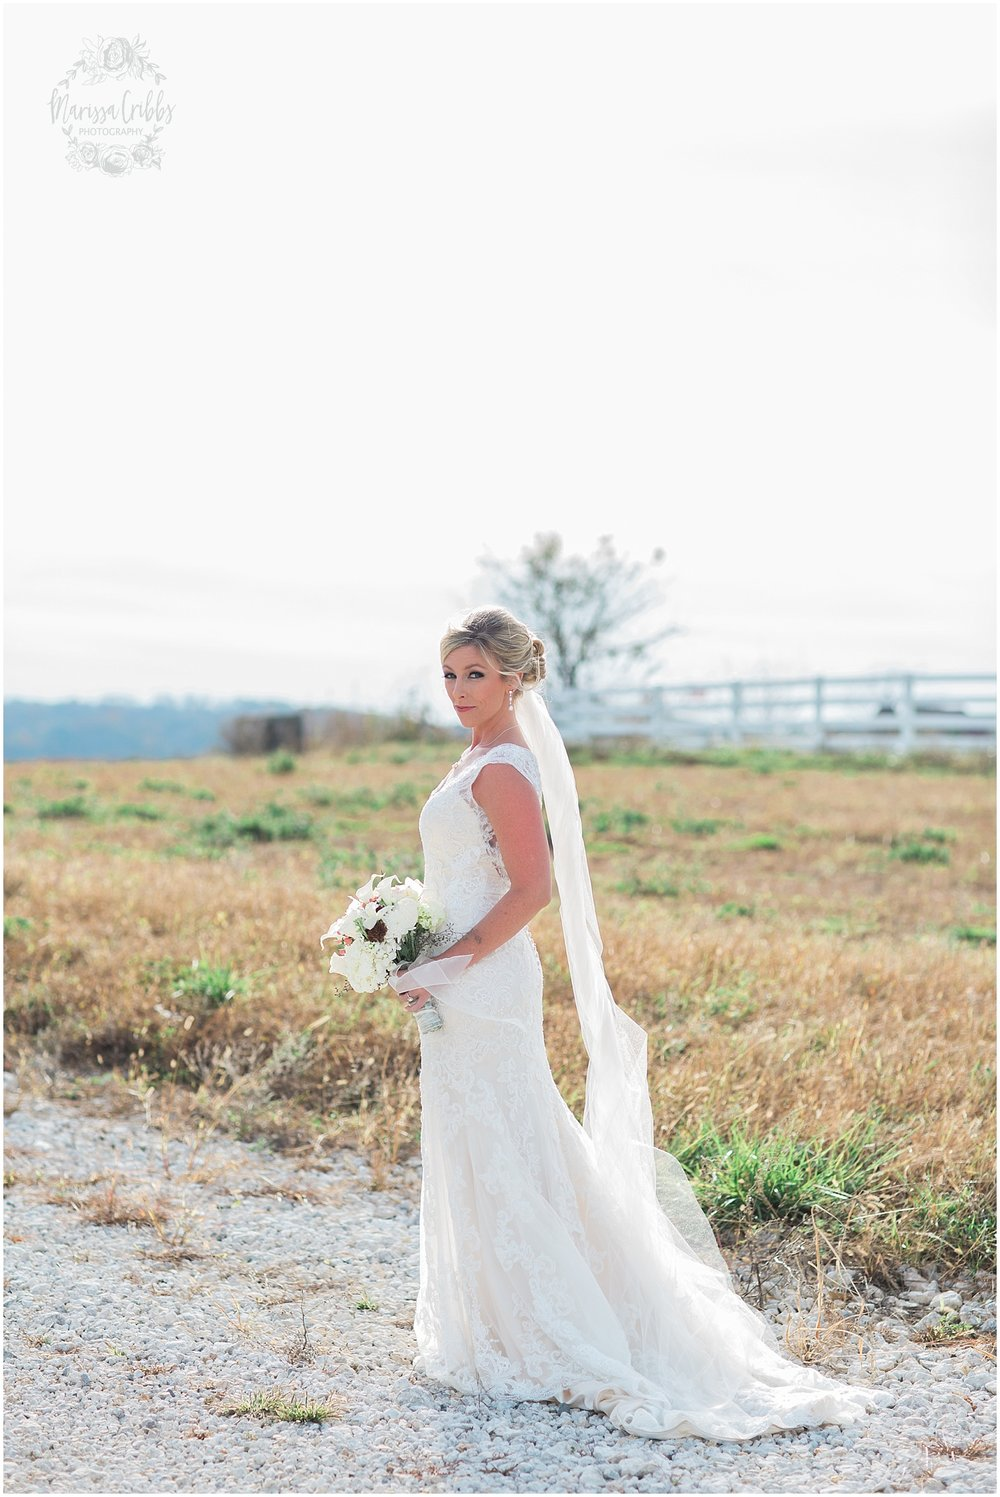 Alex & Amie | Eighteen Ninety Event Space | Marissa Cribbs Photography | Kansas City Perfect Wedding Guide_1282.jpg